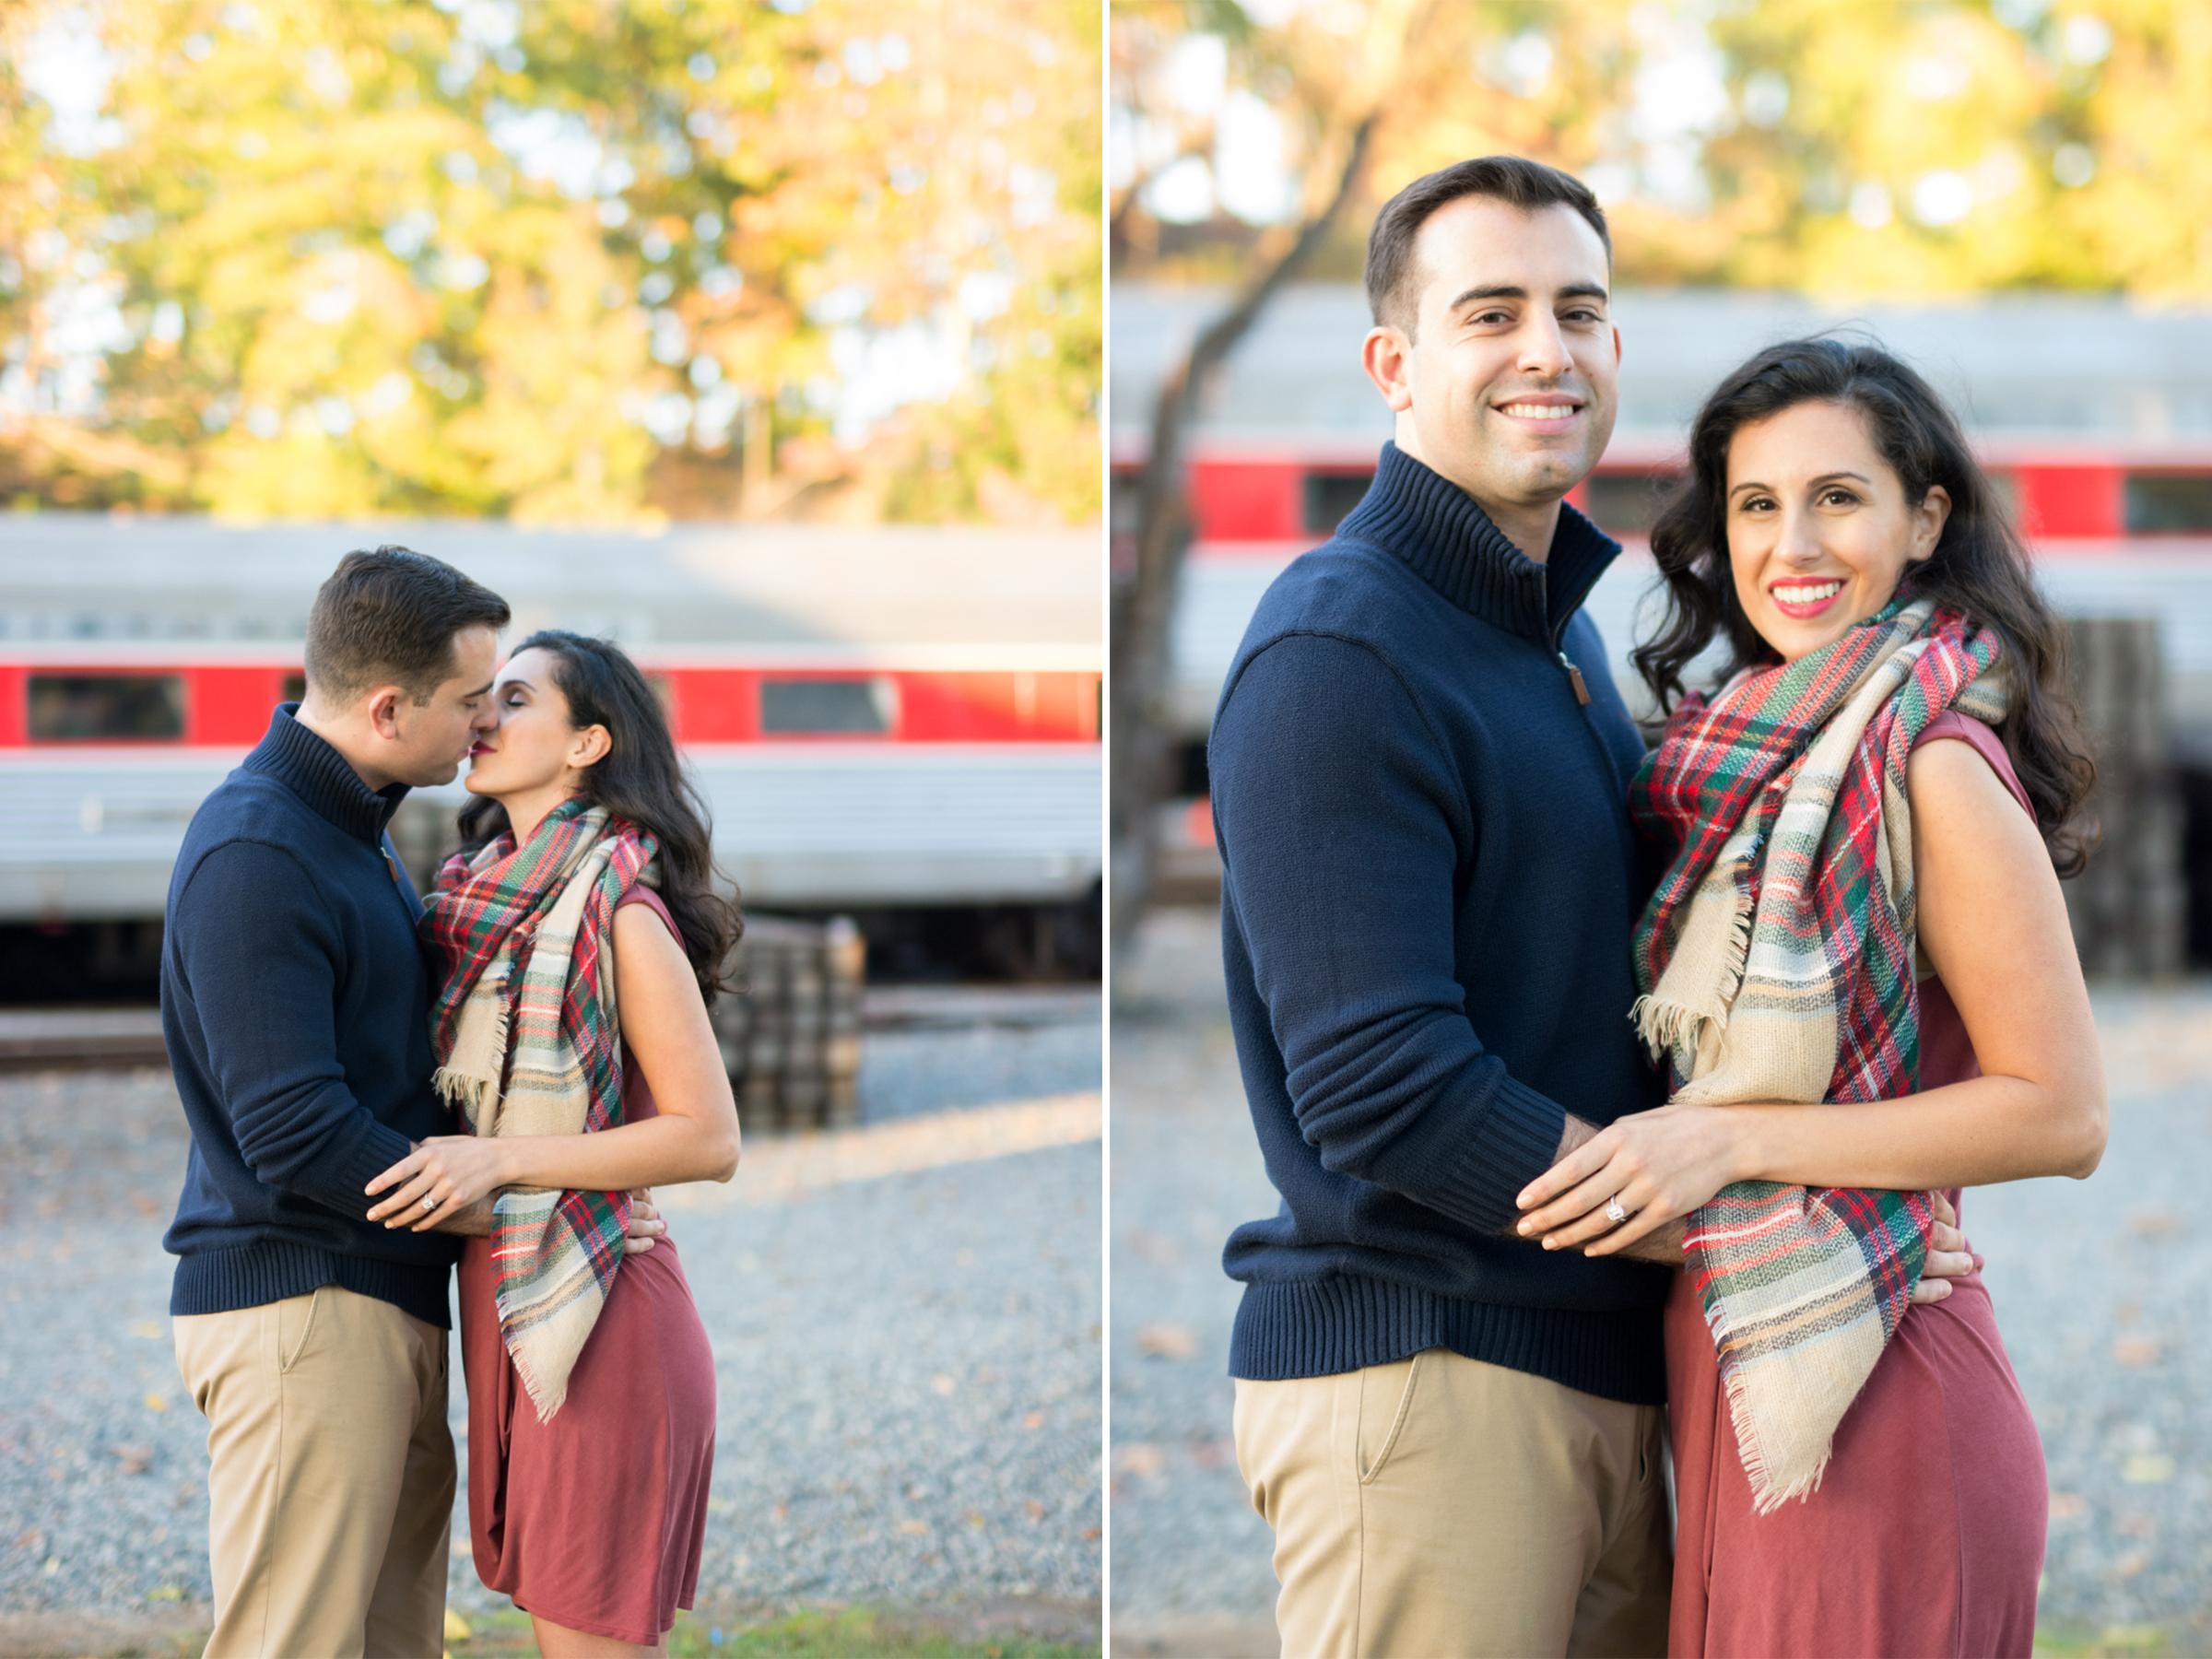 M+J Engagement Photos 8- Whippany Railway Museum- New Jersey -Olivia Christina Photography.jpg